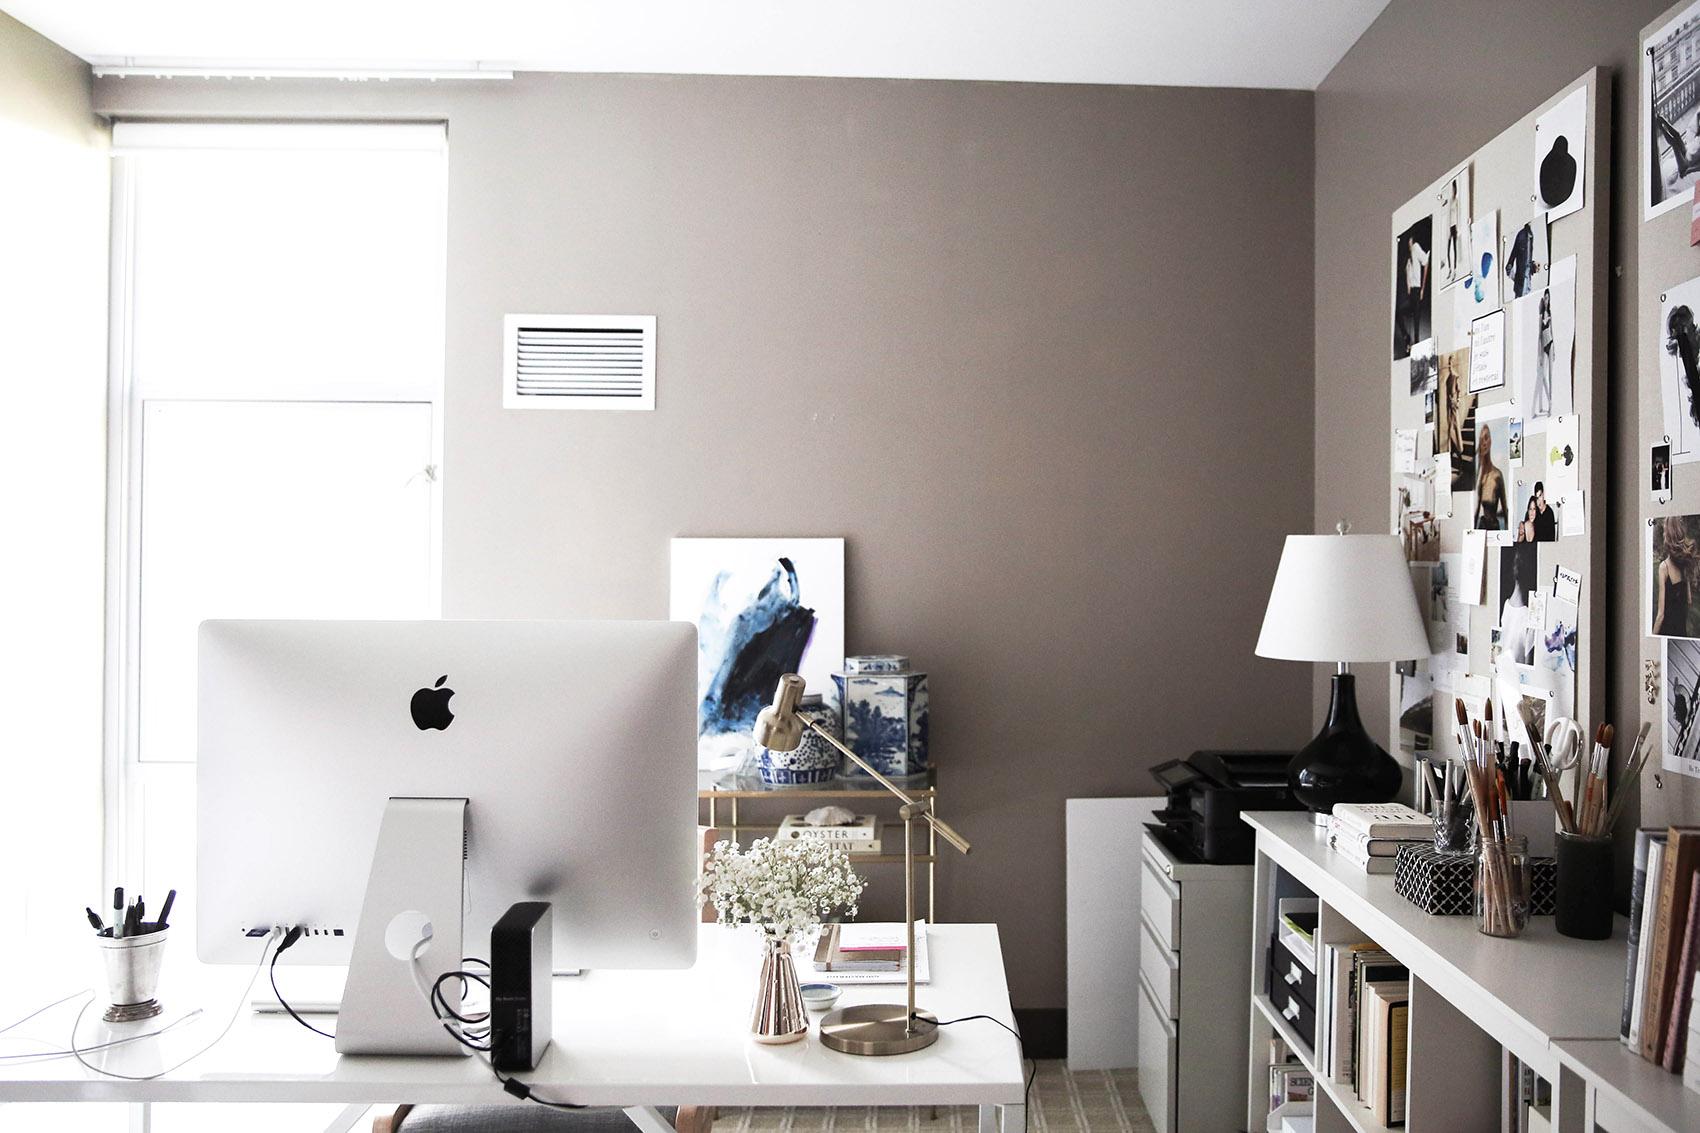 victoria-mcginley-studio-vms-office